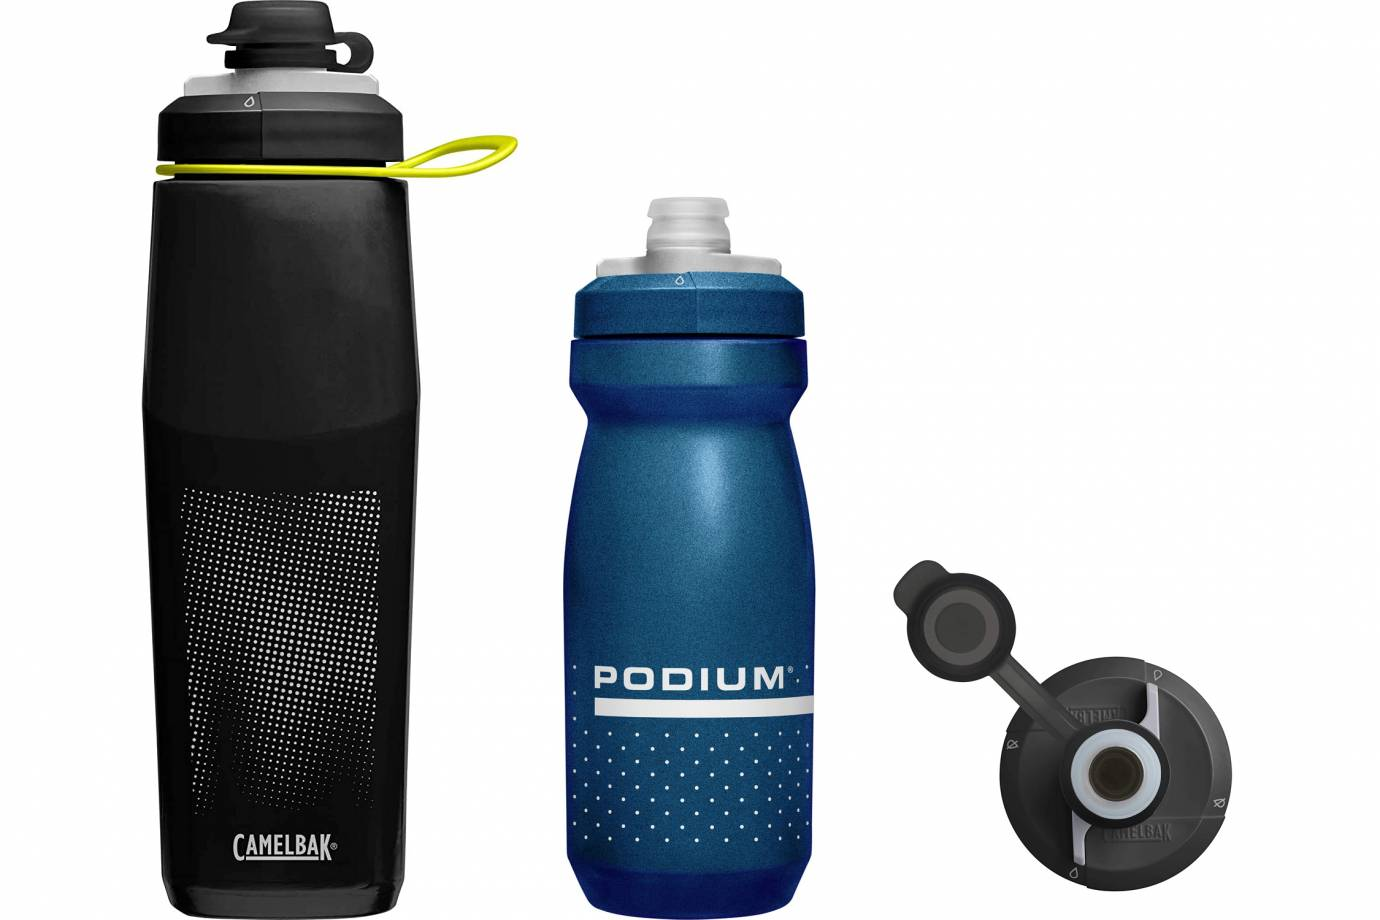 CamelBak water bottle recall